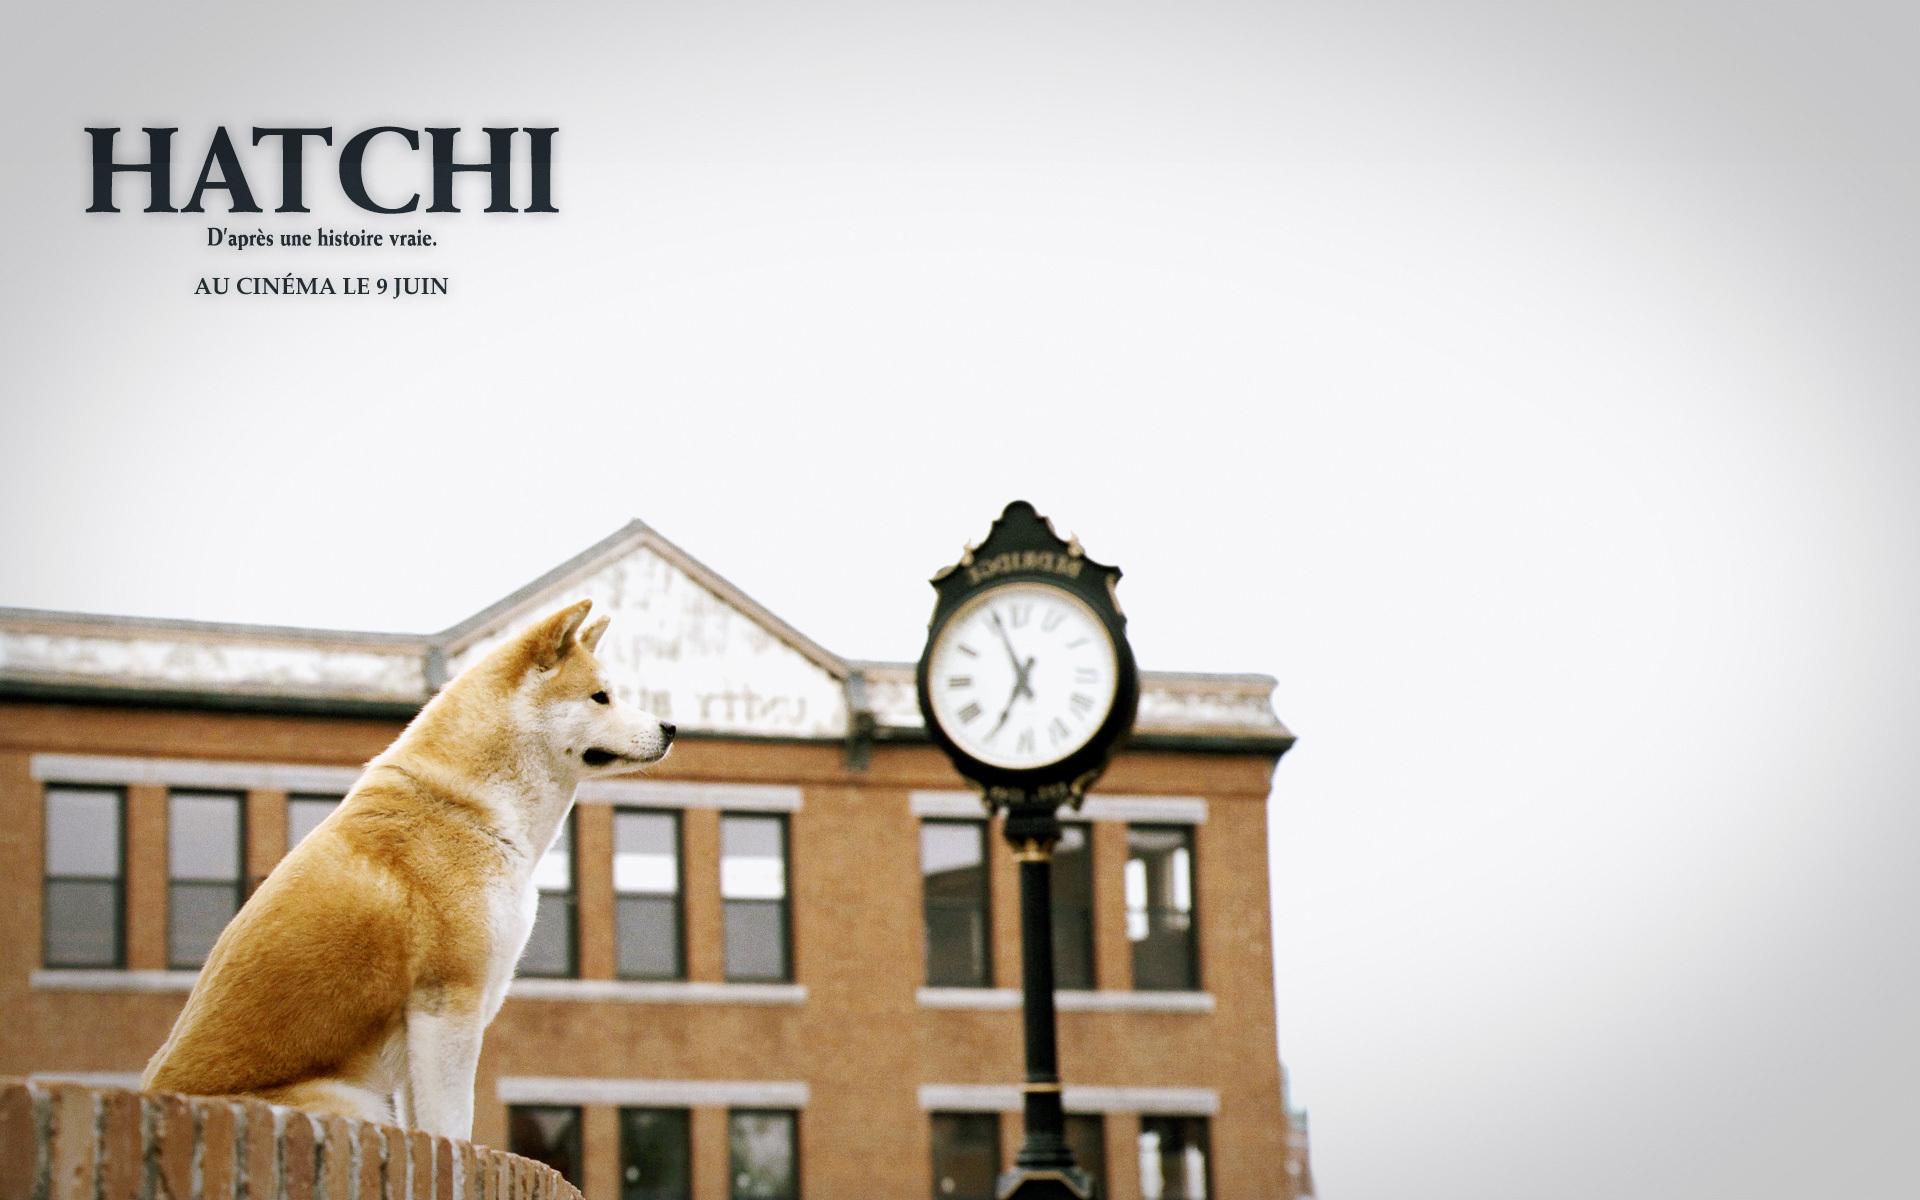 Hachiko Dog Movie Free Download